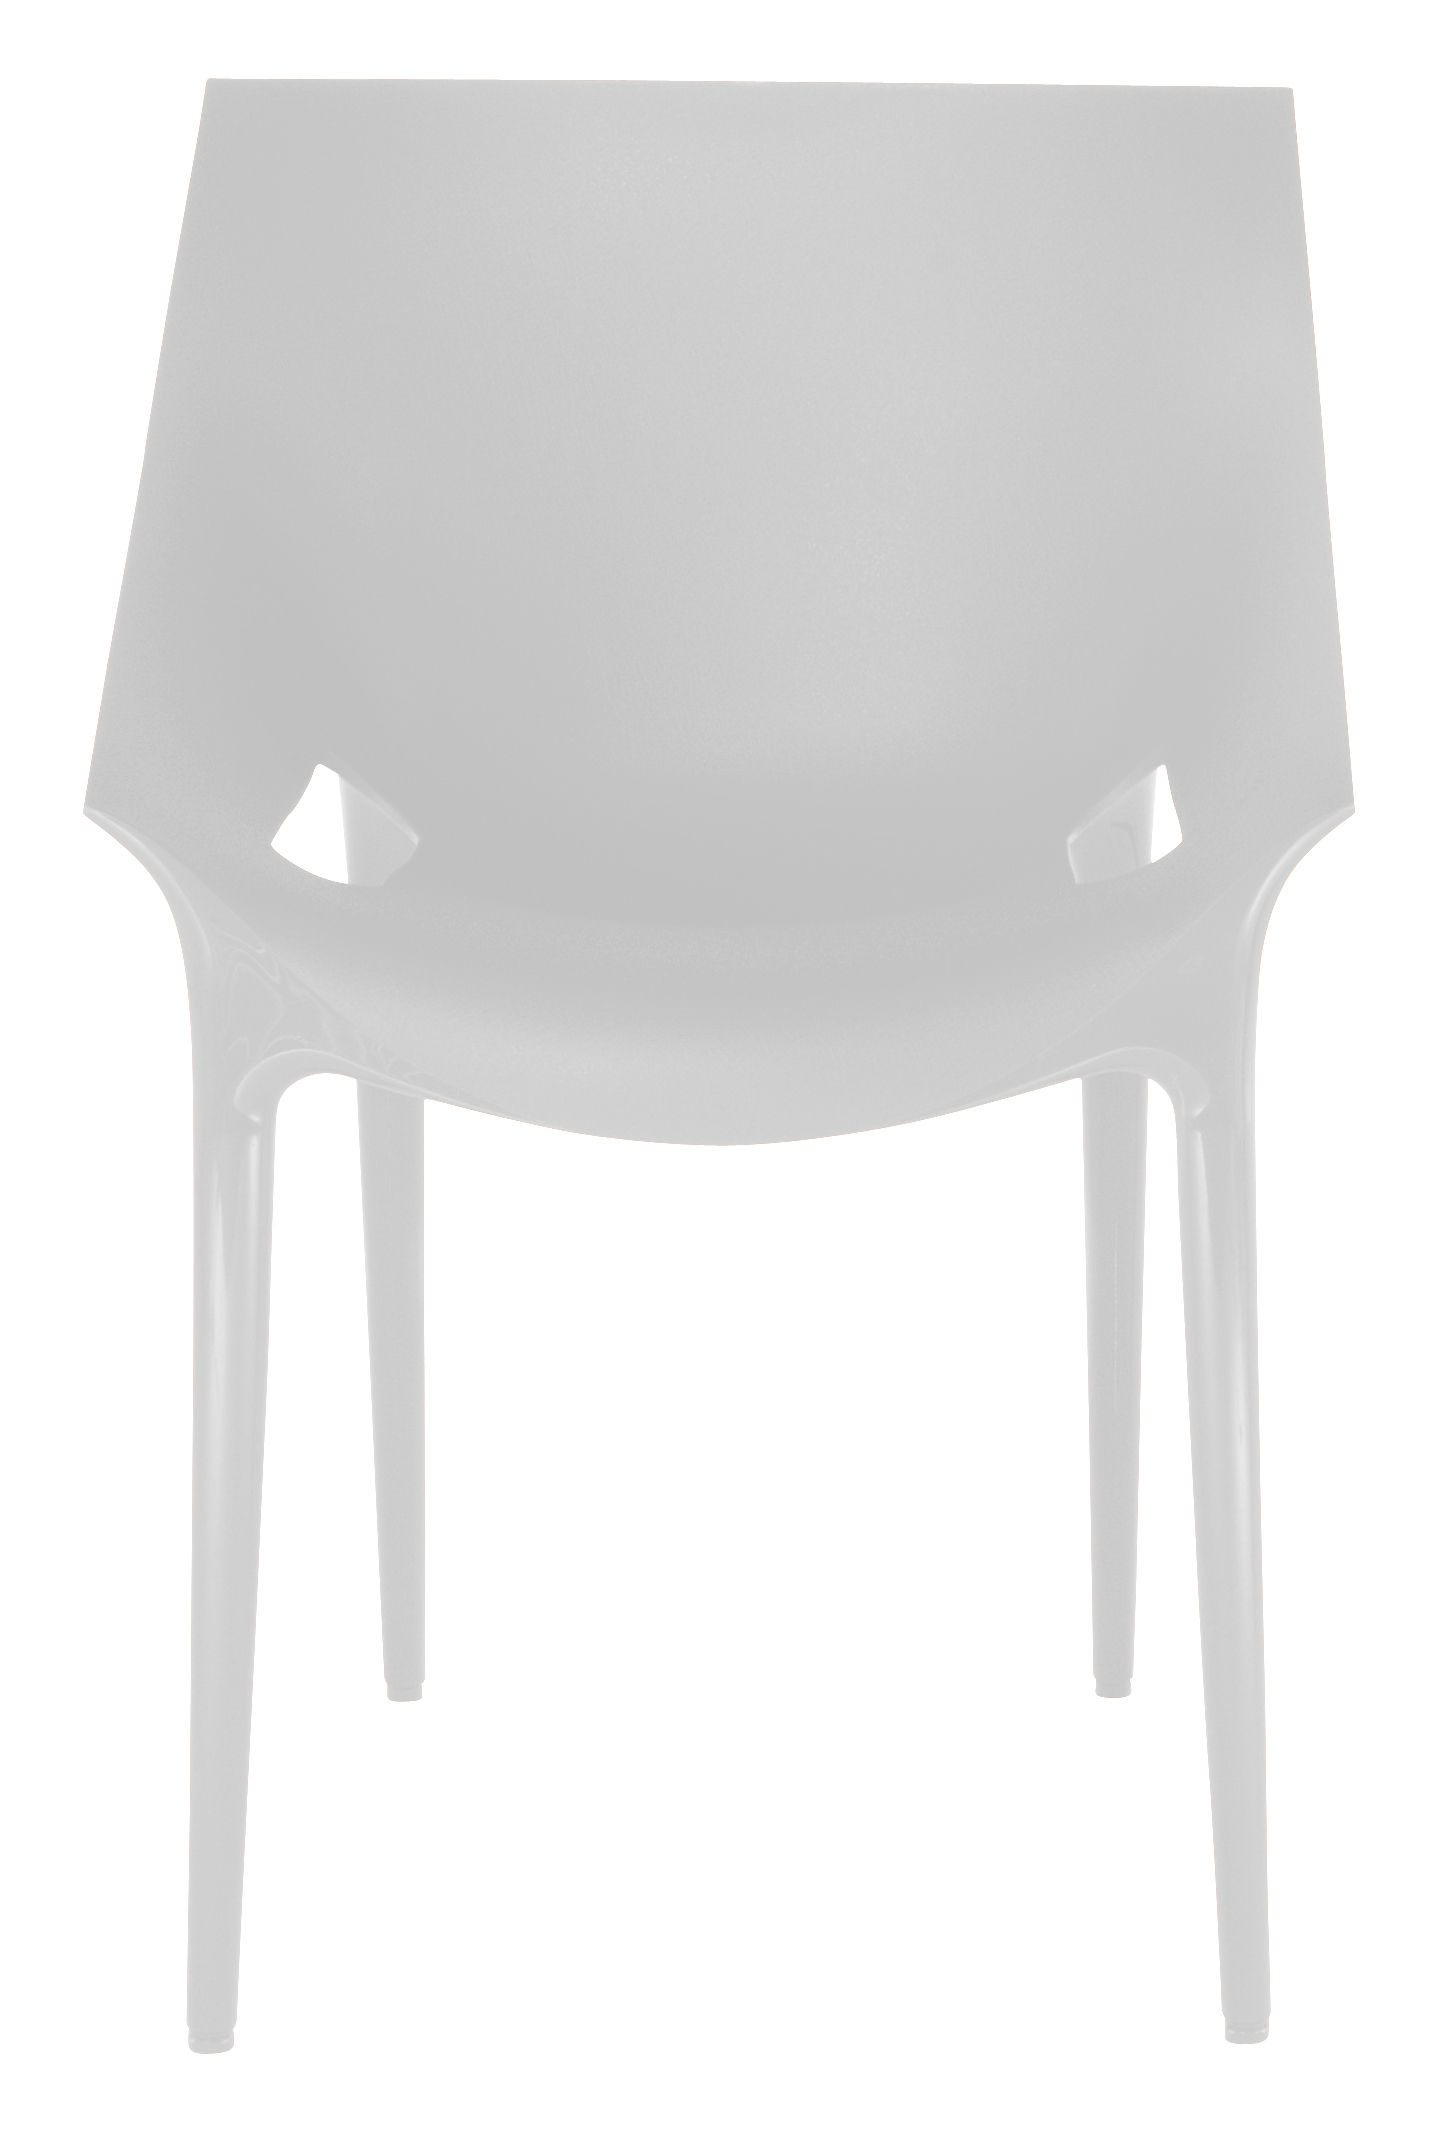 Möbel - Stühle  - Dr. YES Stapelbarer Sessel - Kartell - Weiß - Polypropylen